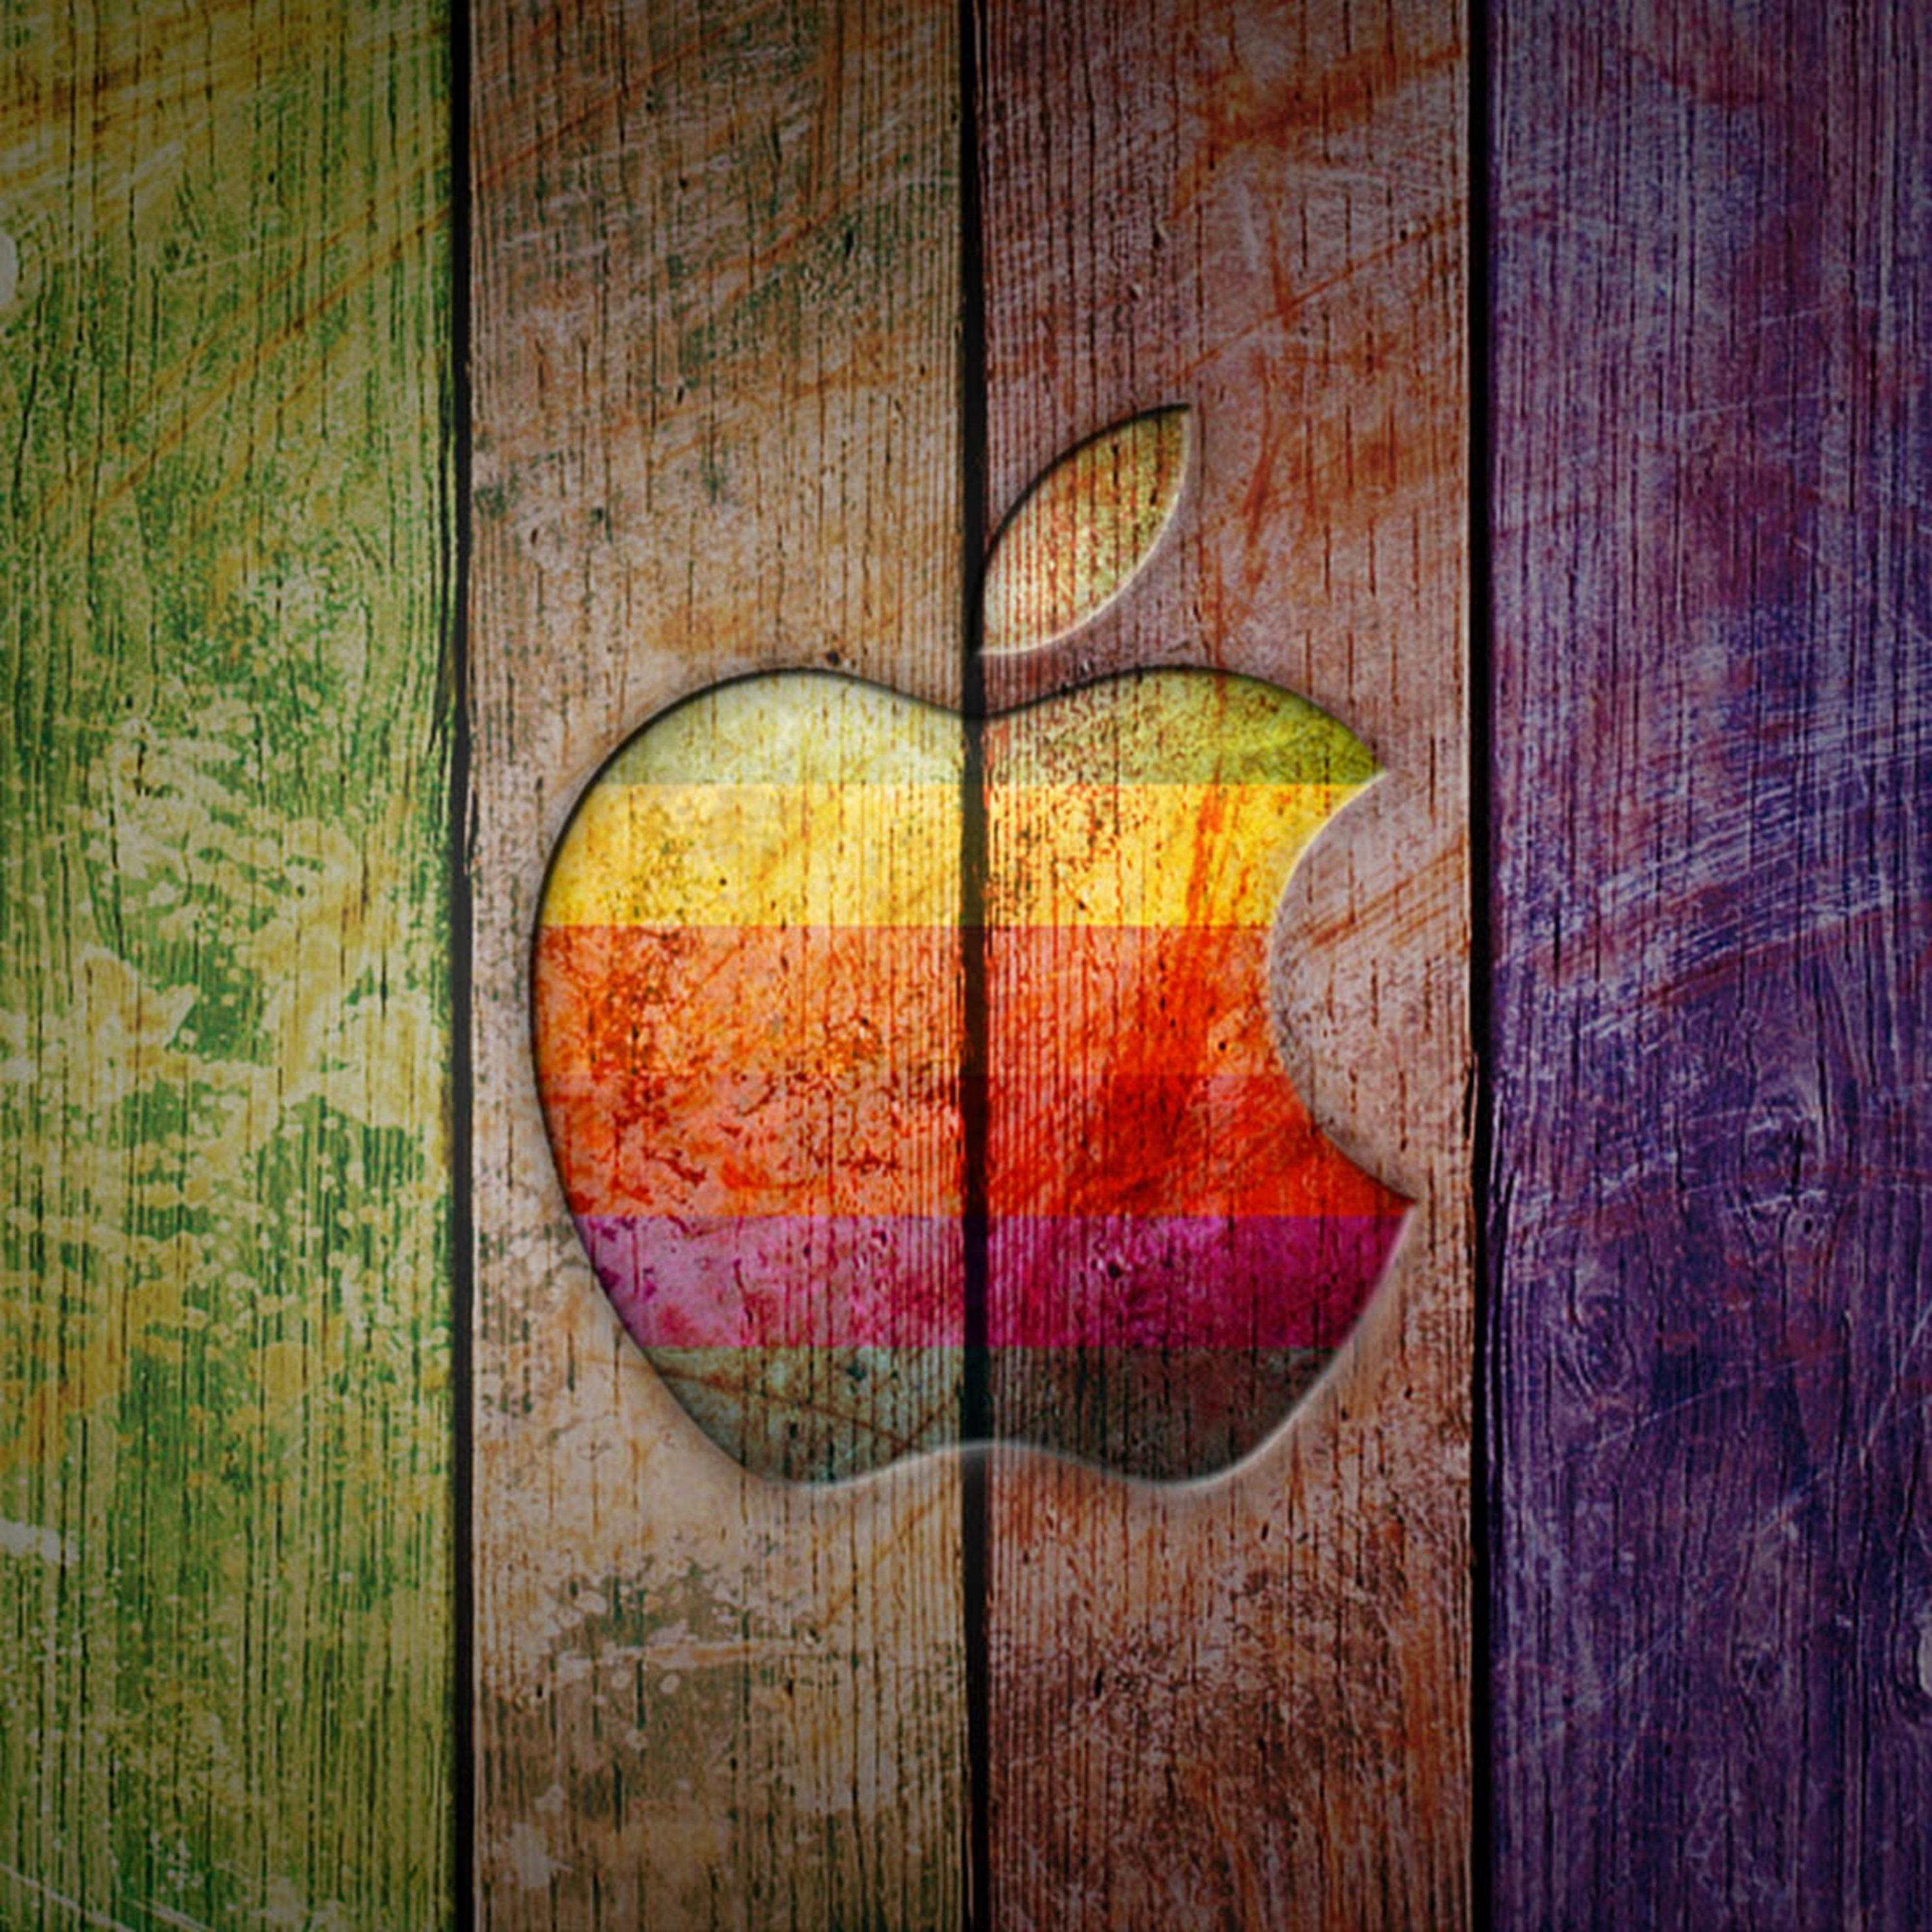 2934x2934 iOS iPad wallpaper 4k Apple Logo on Colorful Wood Ipad Wallpaper 2934x2934 pixels resolution